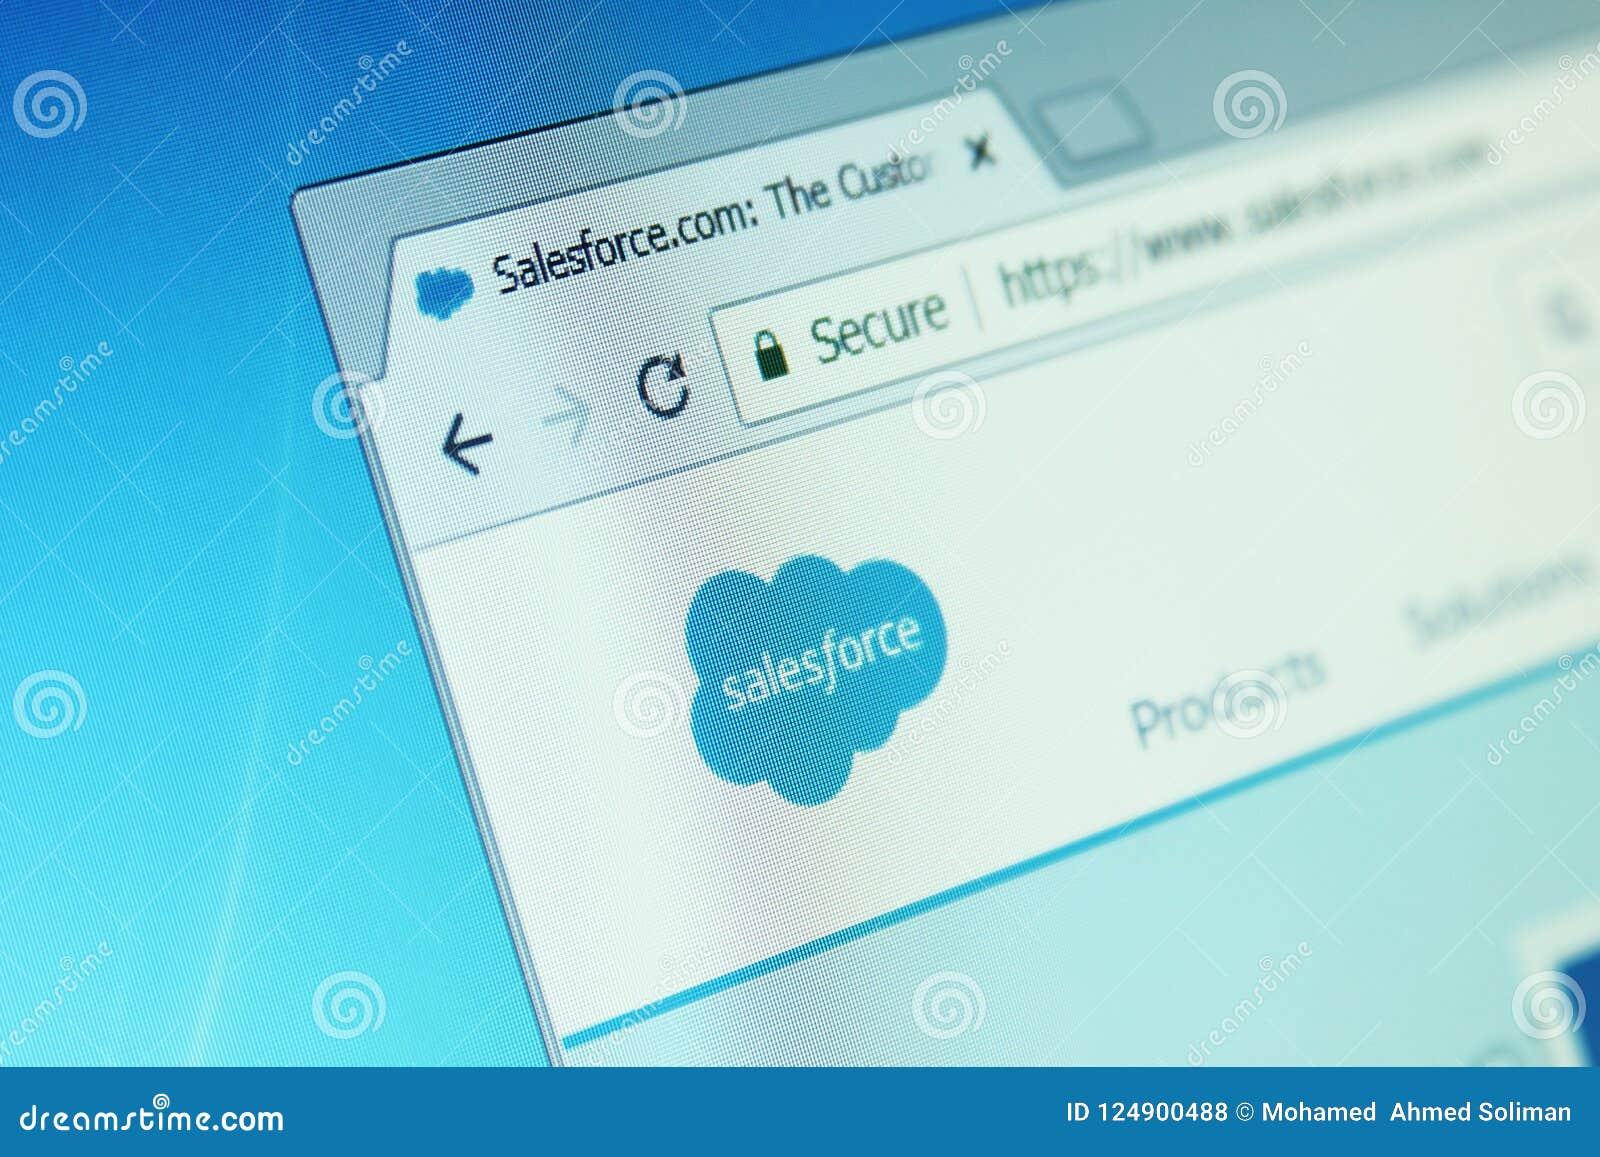 Salesforce-Website